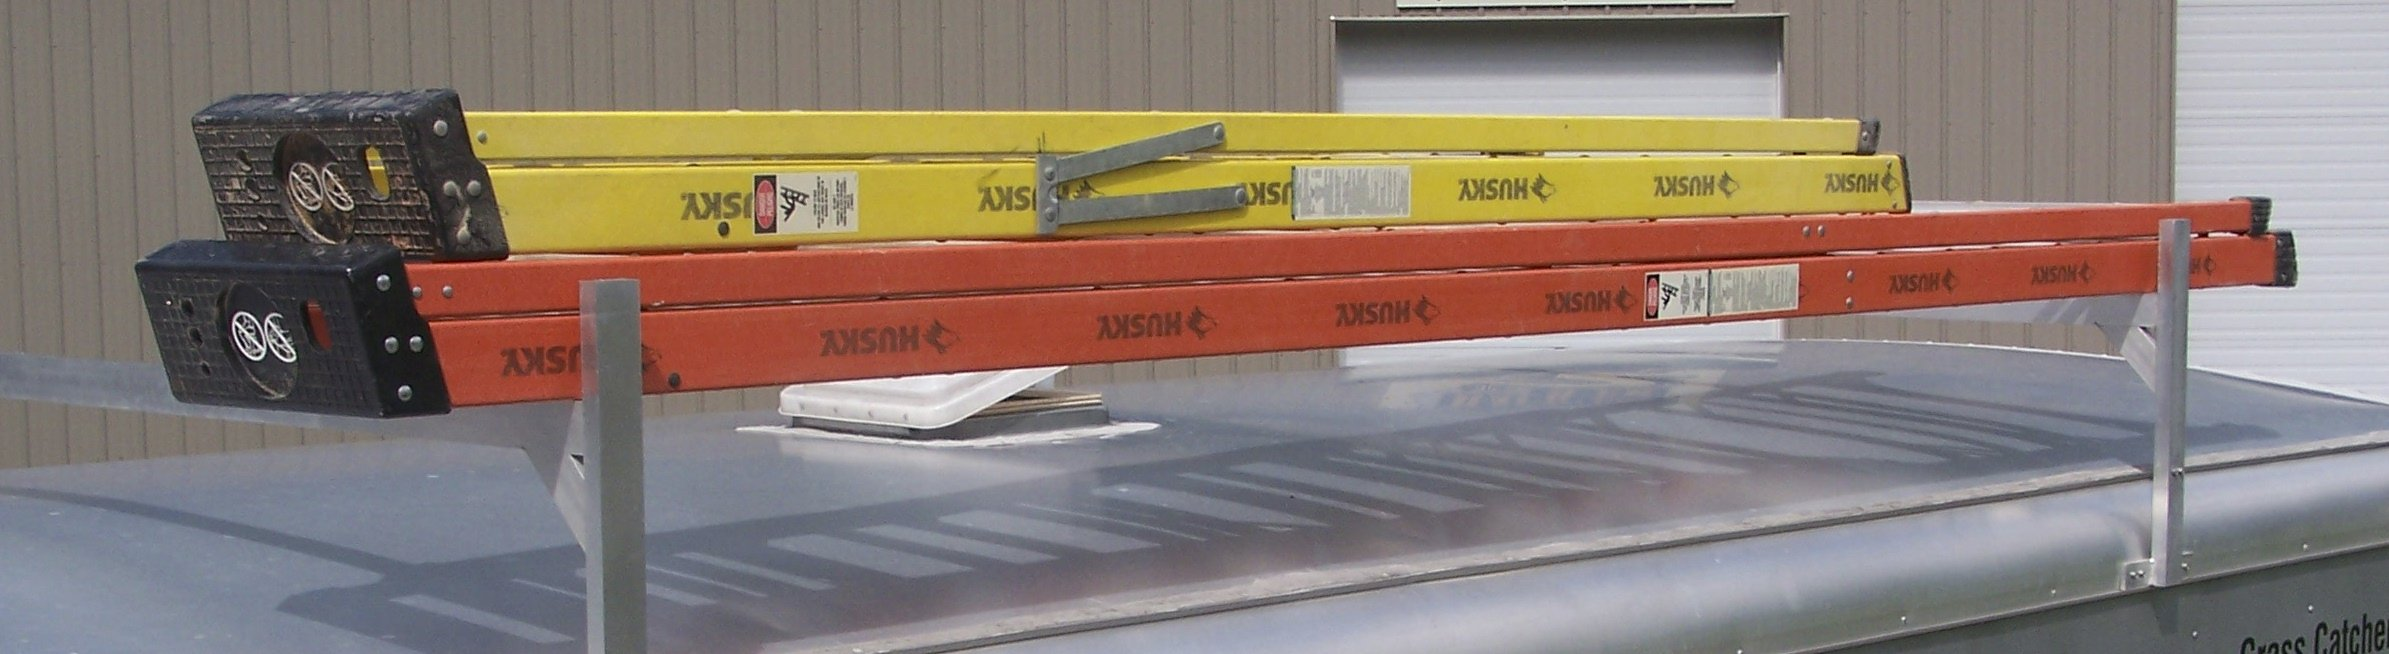 Fitz-All Adjustable Aluminum Trailer Ladder Rack (RA-28) for Enclosed Trailers by Rack'em Mfg